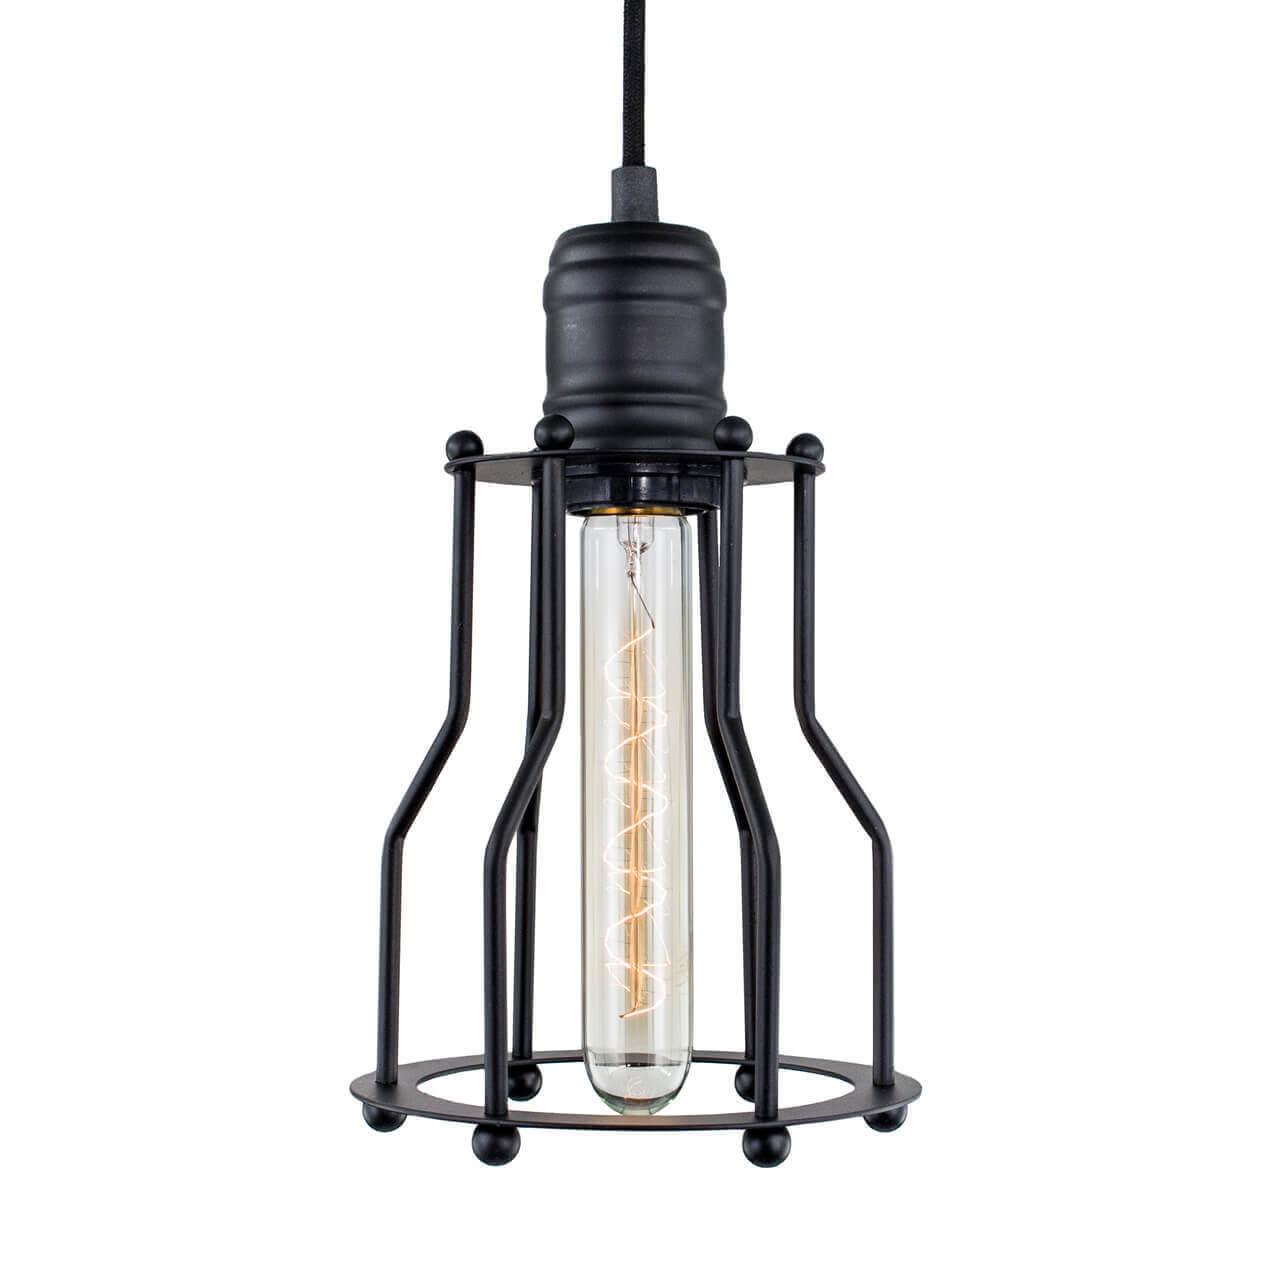 цена на Светильник Citilux CL450201 Эдисон